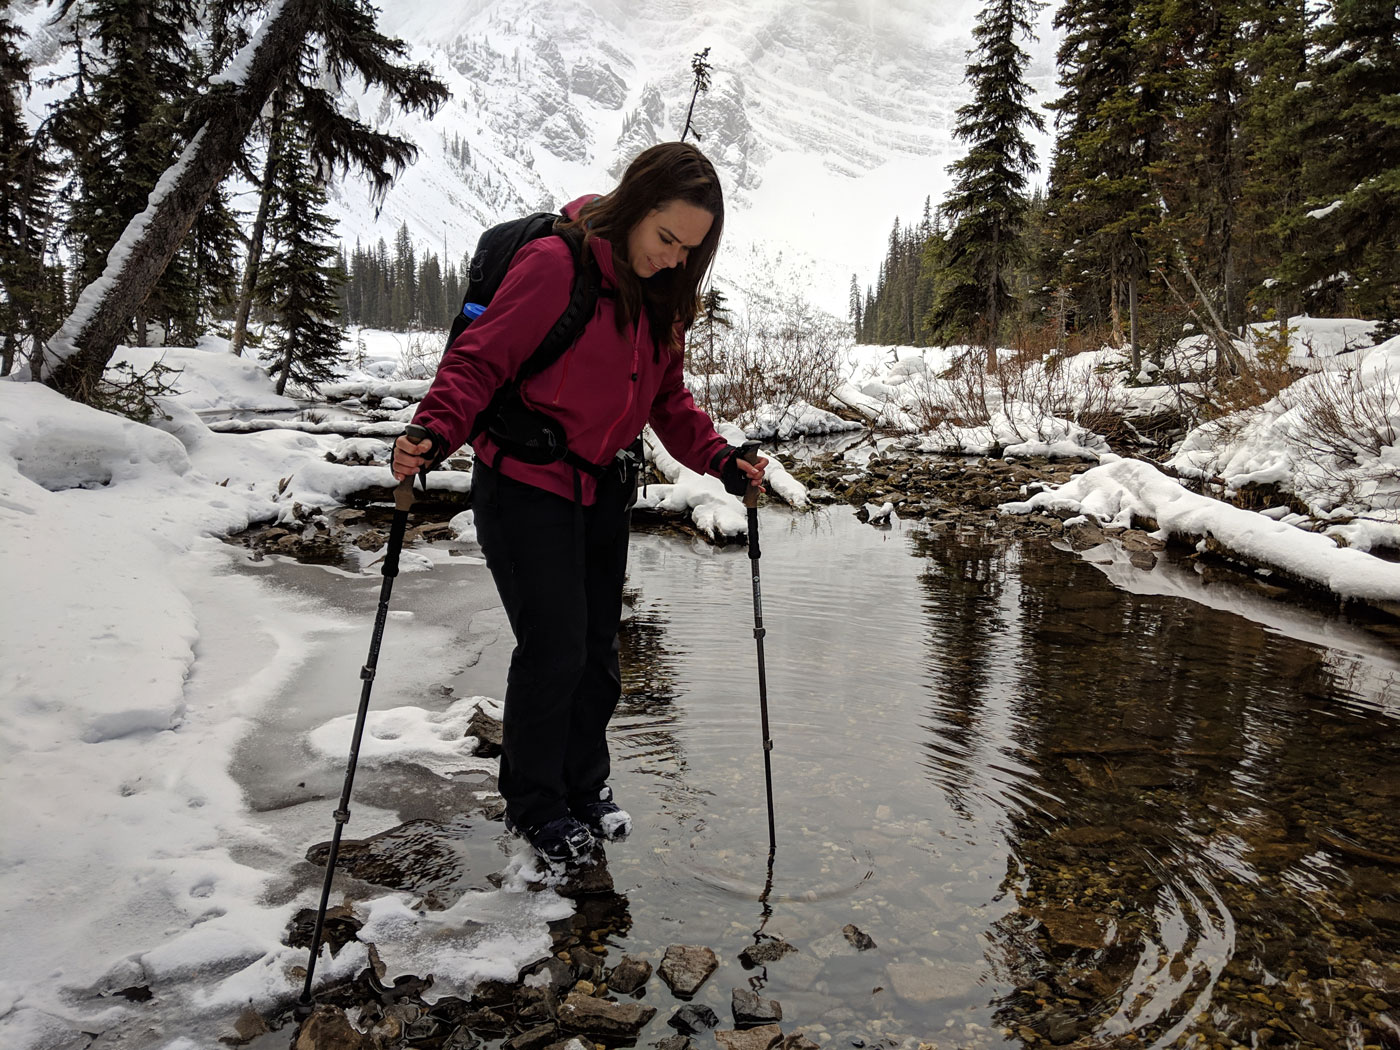 Rawson Lake hike in winter in Kananaskis Country, Alberta, Canada.